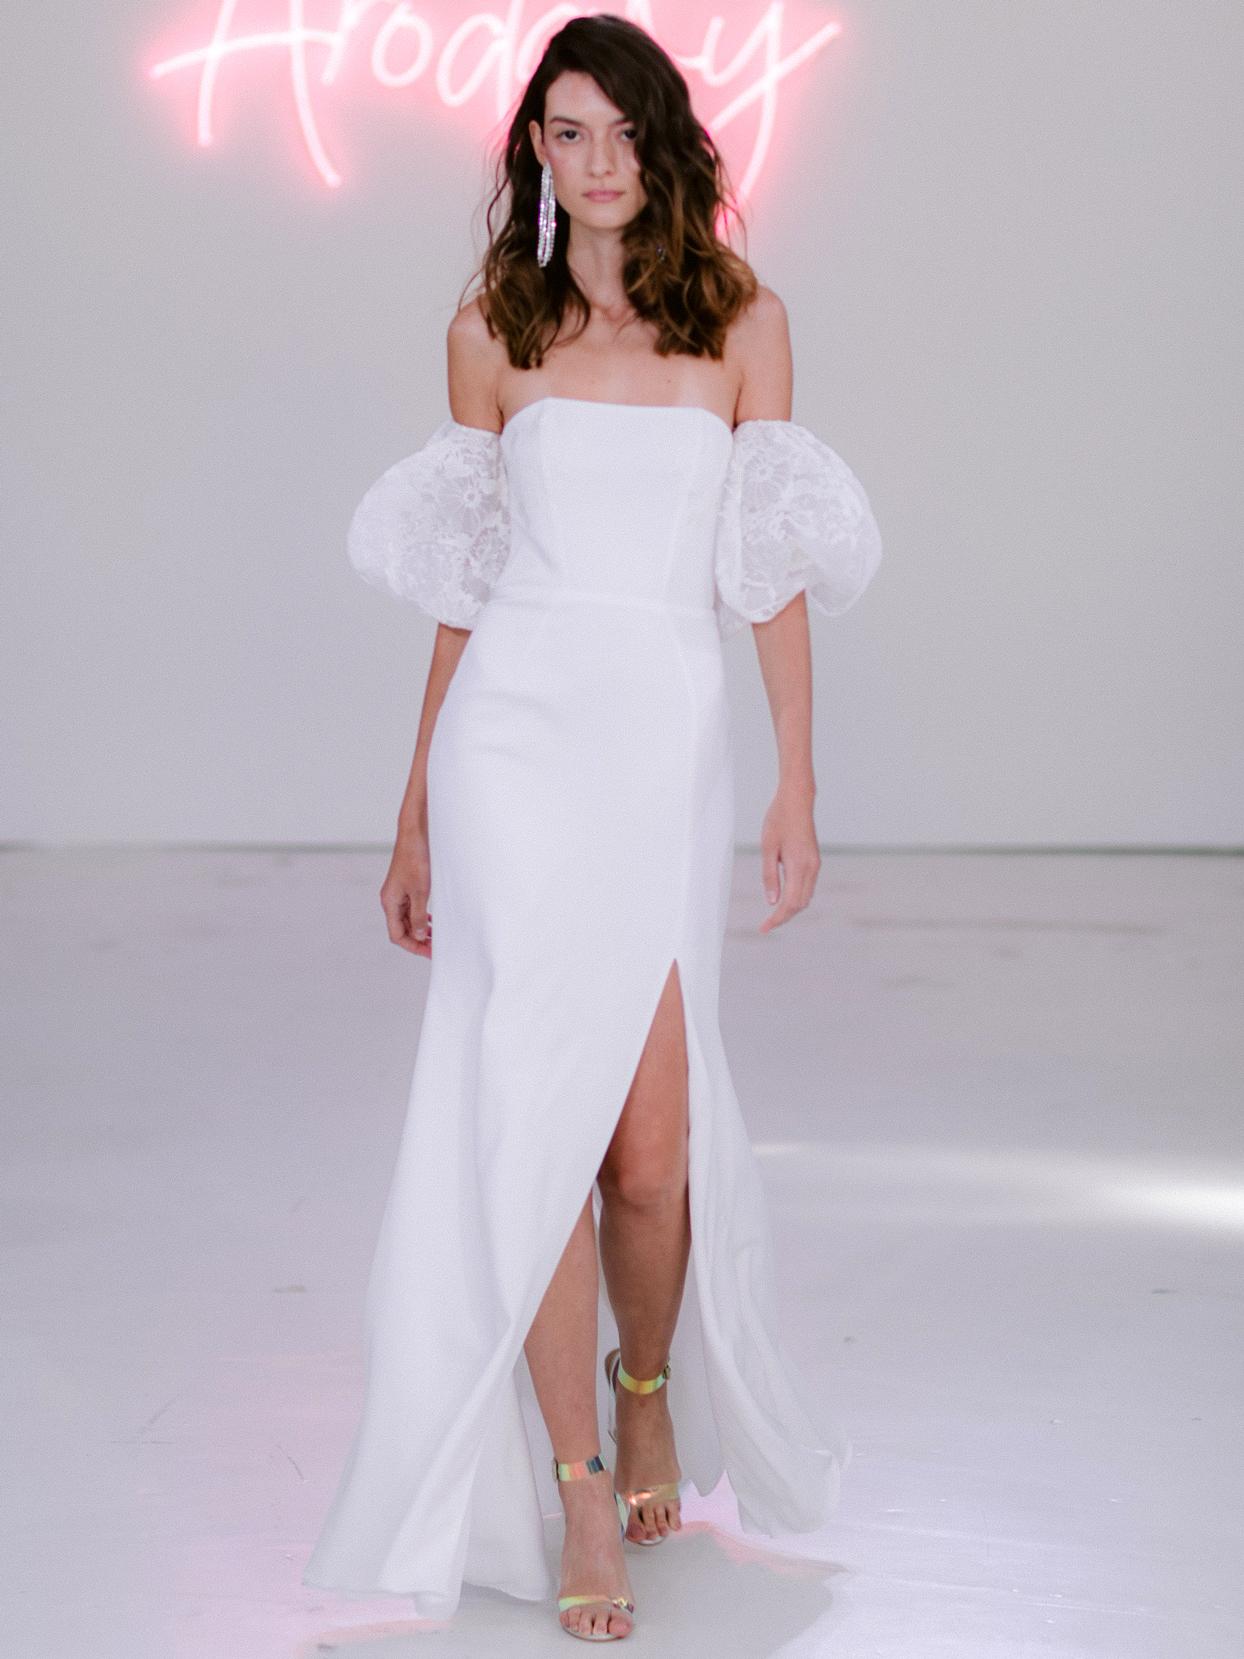 Rime Arodaky X The Mews Bridal off-the-shoulder puffed sleeves side slit wedding dress fall 2020